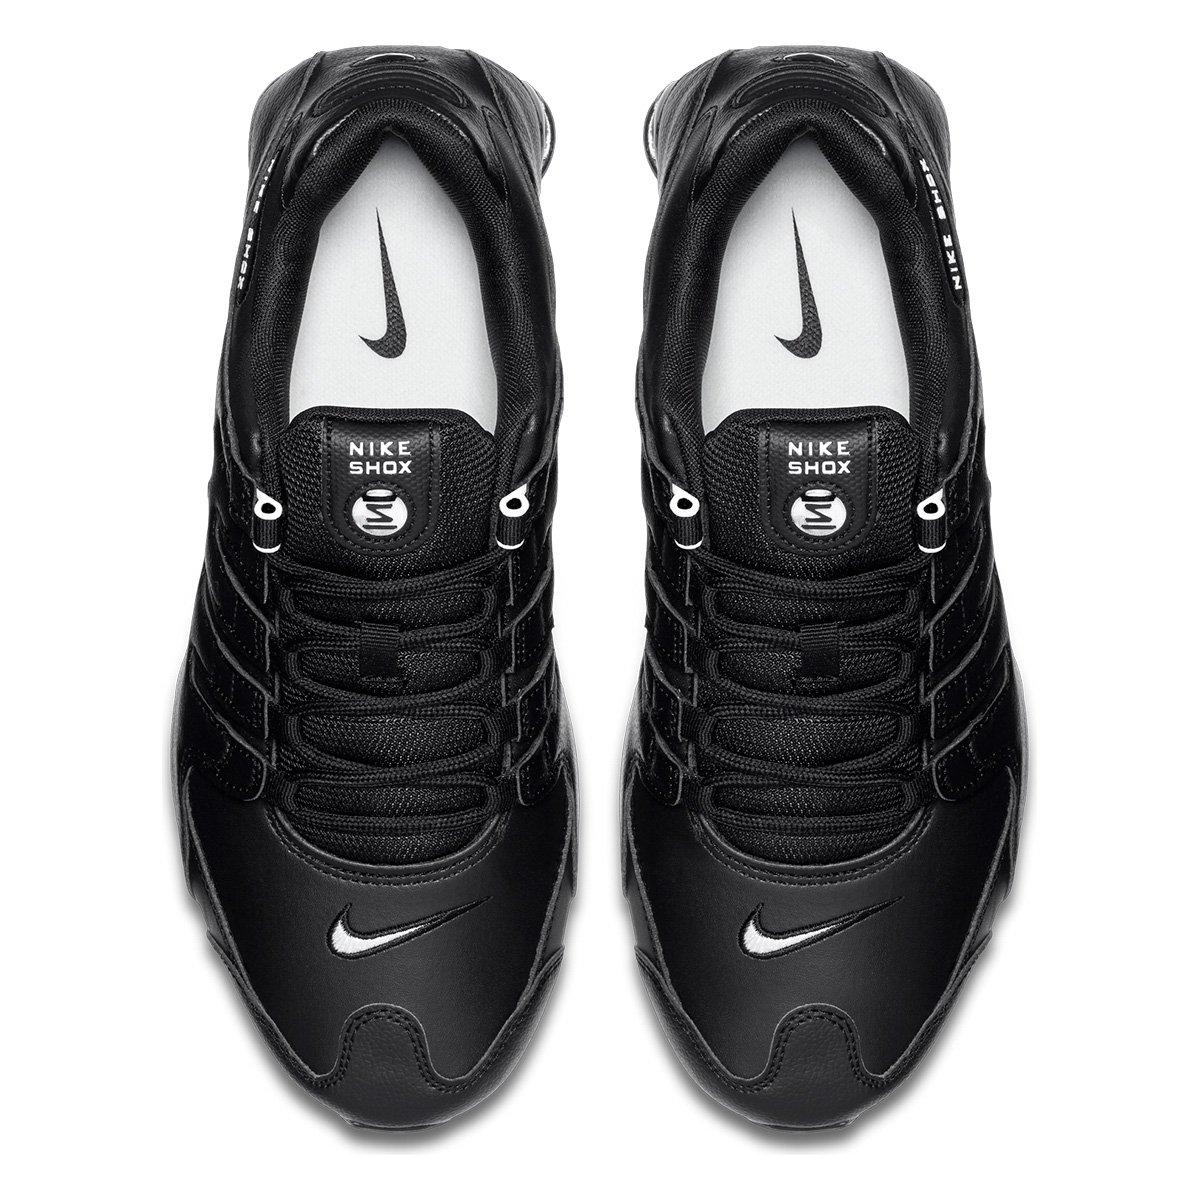 diente retrasar Influyente  Tênis Nike Shox Nz Eu Masculino - Preto | Netshoes